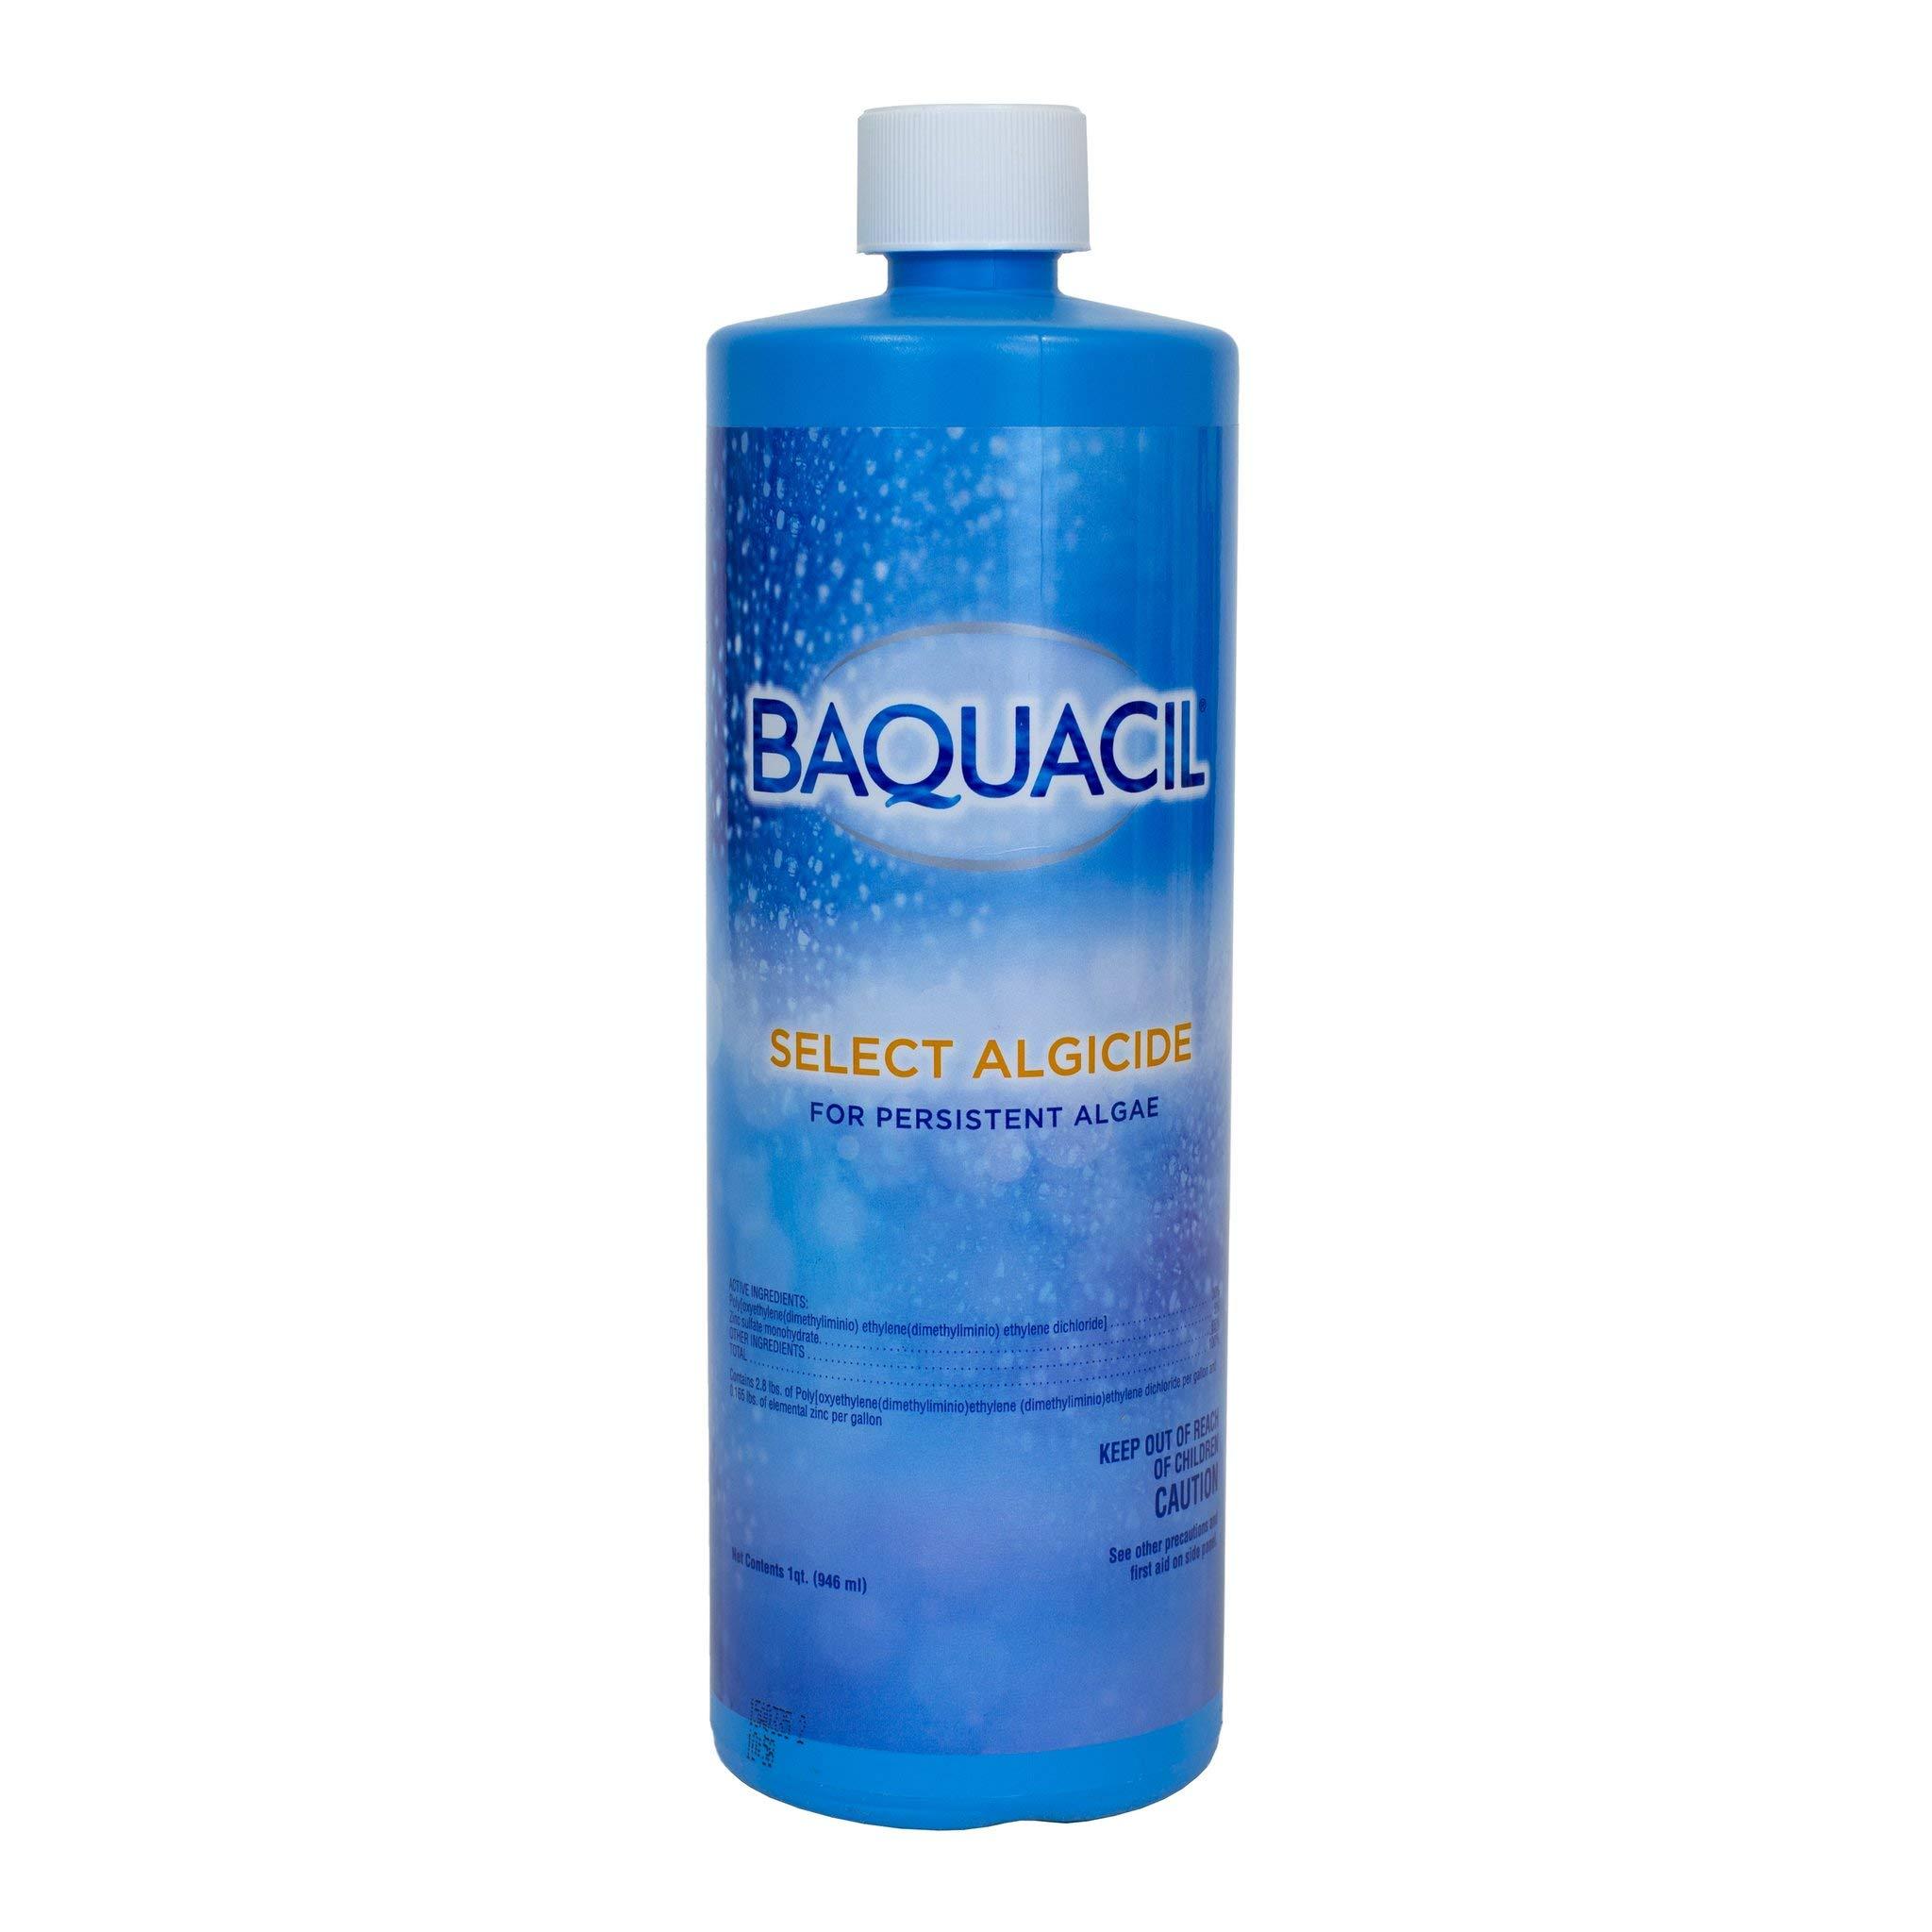 Baquacil 84406 Select Swimming Pool Chemical, Algaecide, Clear by Baquacil